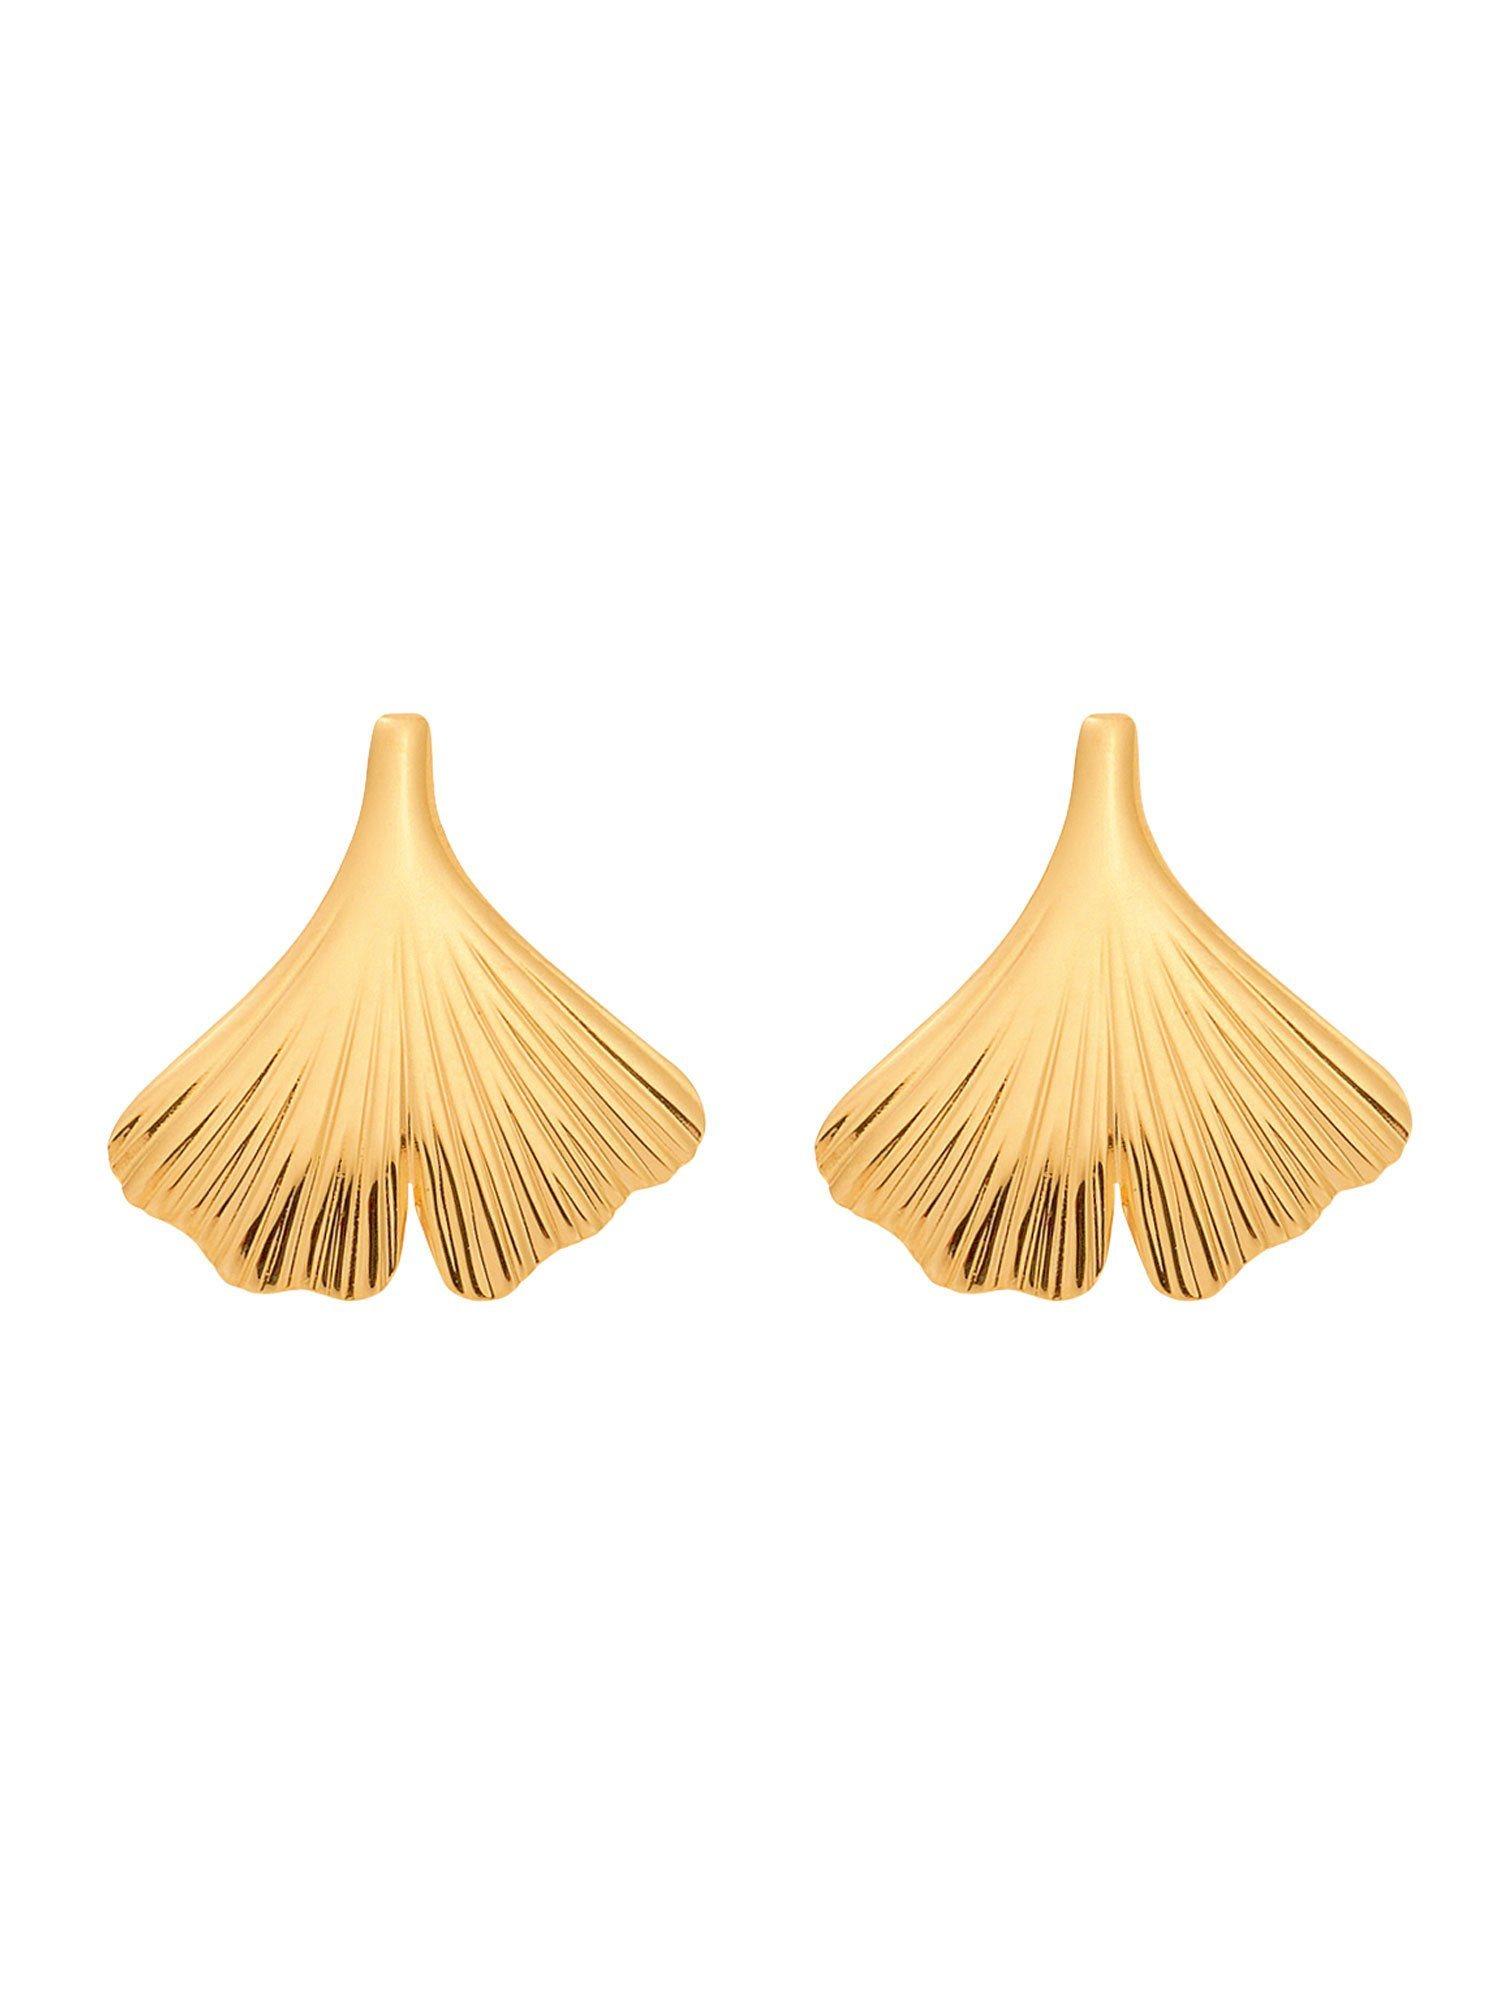 Adelia´s Paar Ohrstecker »Gold Ohrringe« Ginkoblatt 14 k 585 Gelbgold | Schmuck > Ohrschmuck & Ohrringe > Ohrstecker | Adelia´s